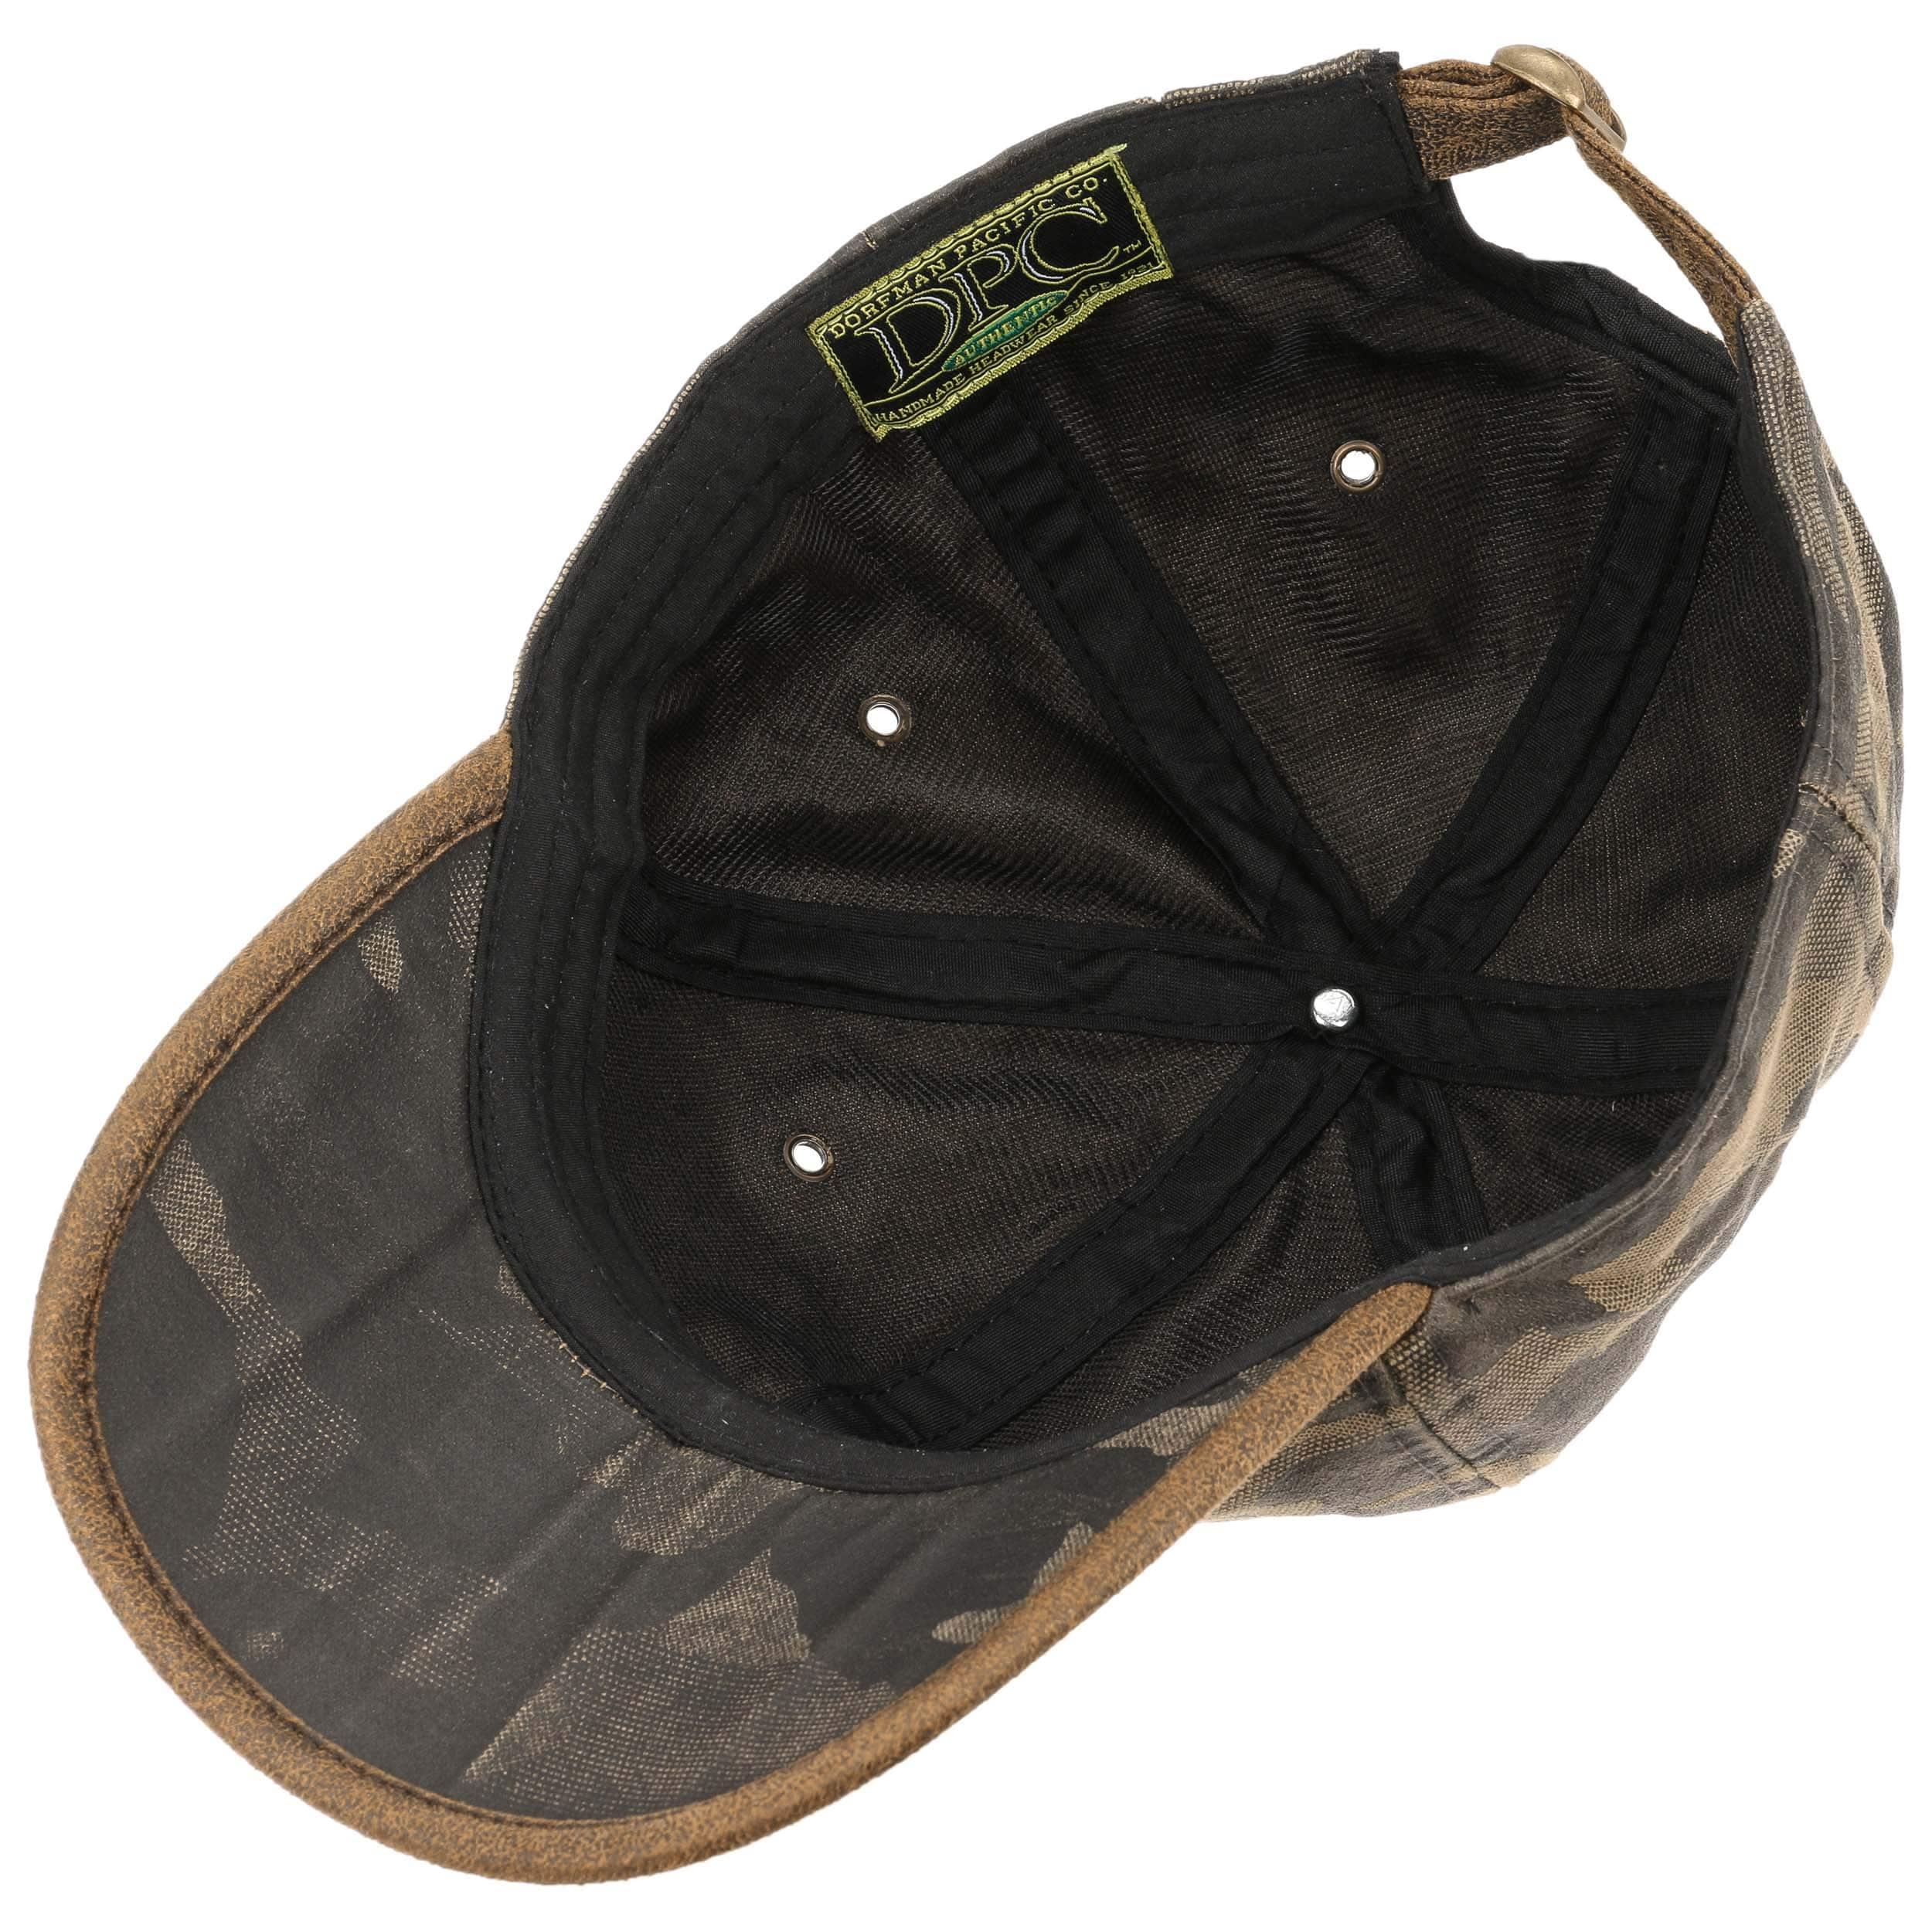 Dealtrade Indiana Jones Casquette Cosplay Costume Adulte Unisexe Beige Chapeau De Baseball Halloween D/éguisement V/êtements Marchandise Accessoires